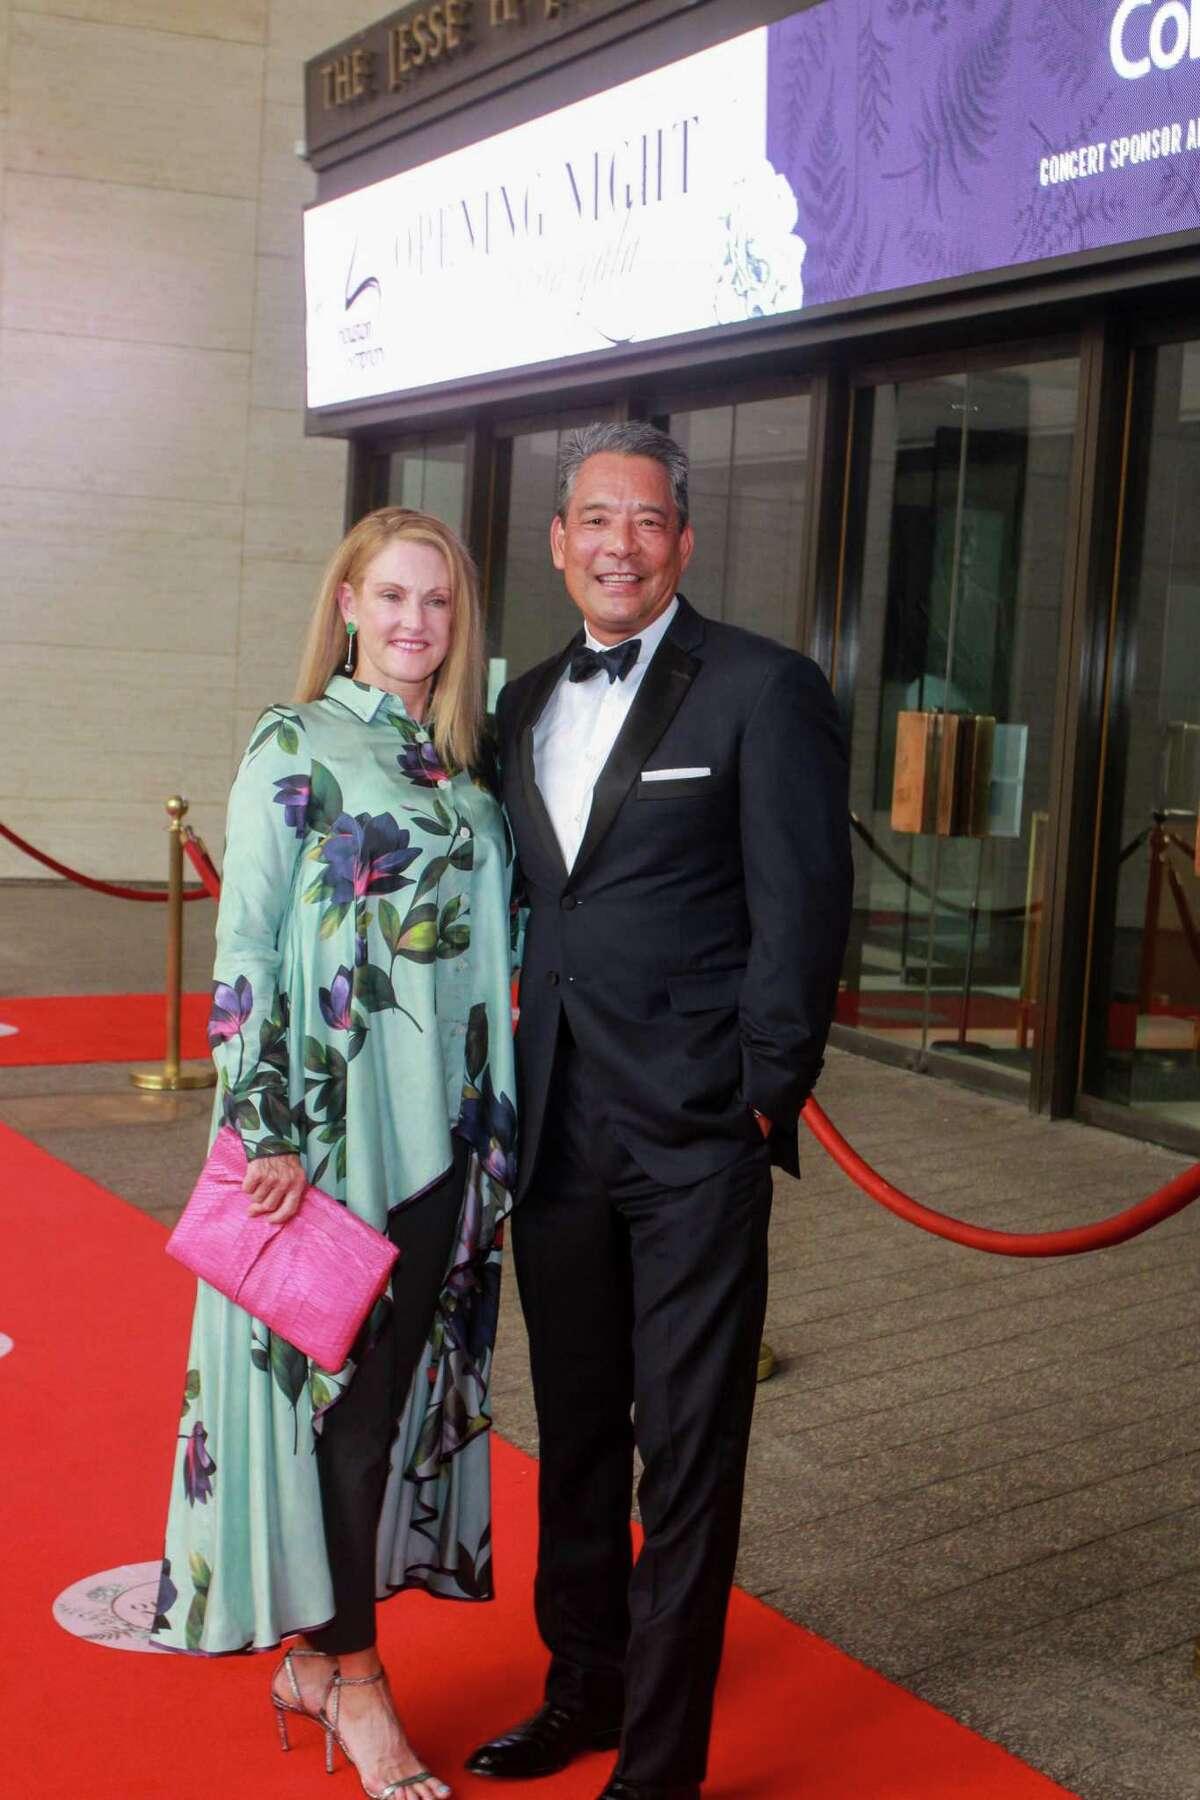 Stephanie and Frank Tsuru at Houston Symphony's opening night on September 12, 2020.